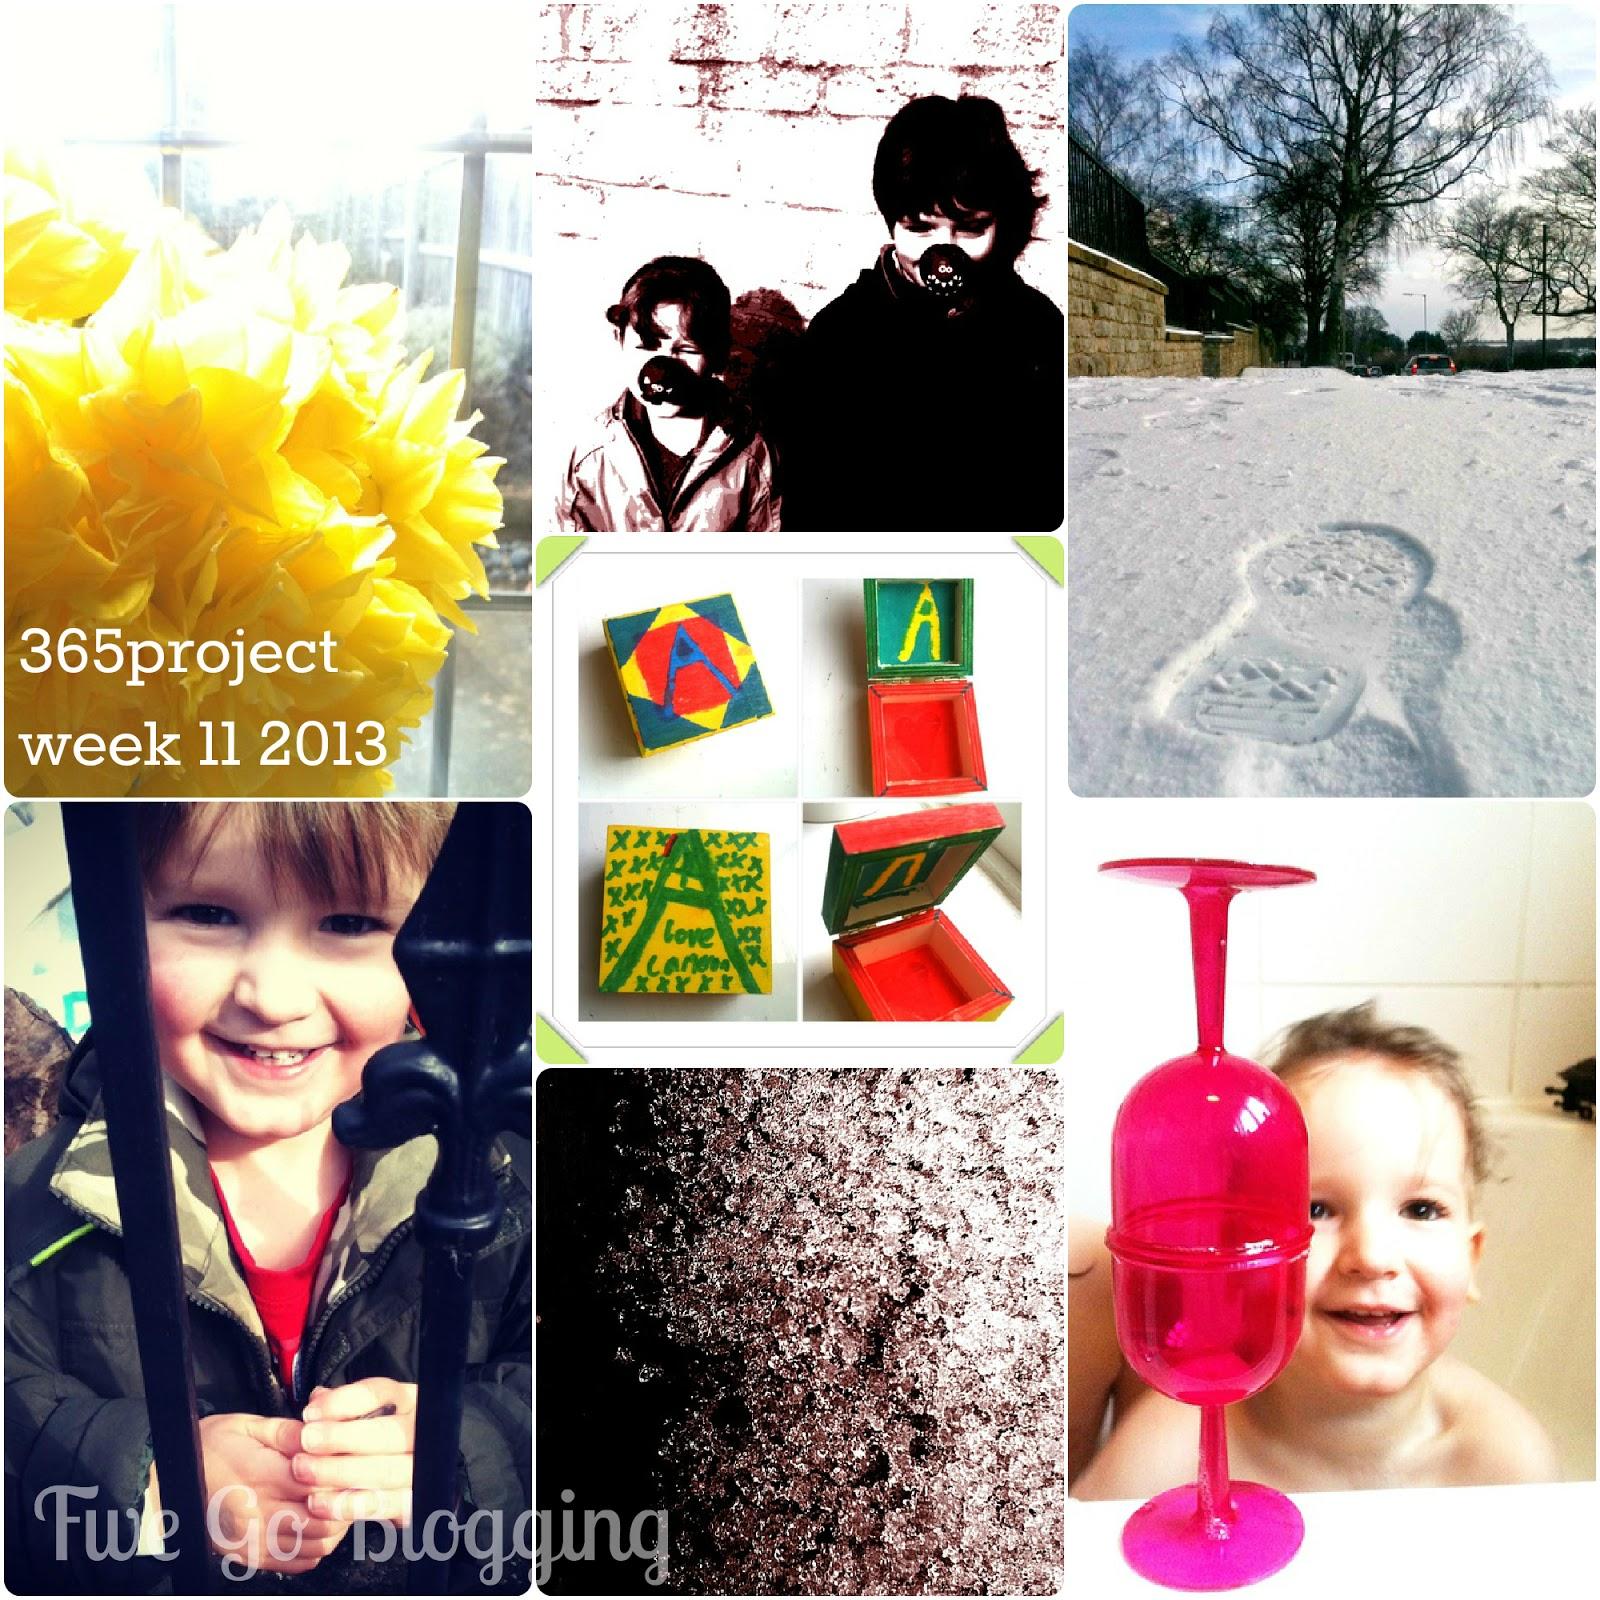 Five Go Blogging 365project week 11 2013